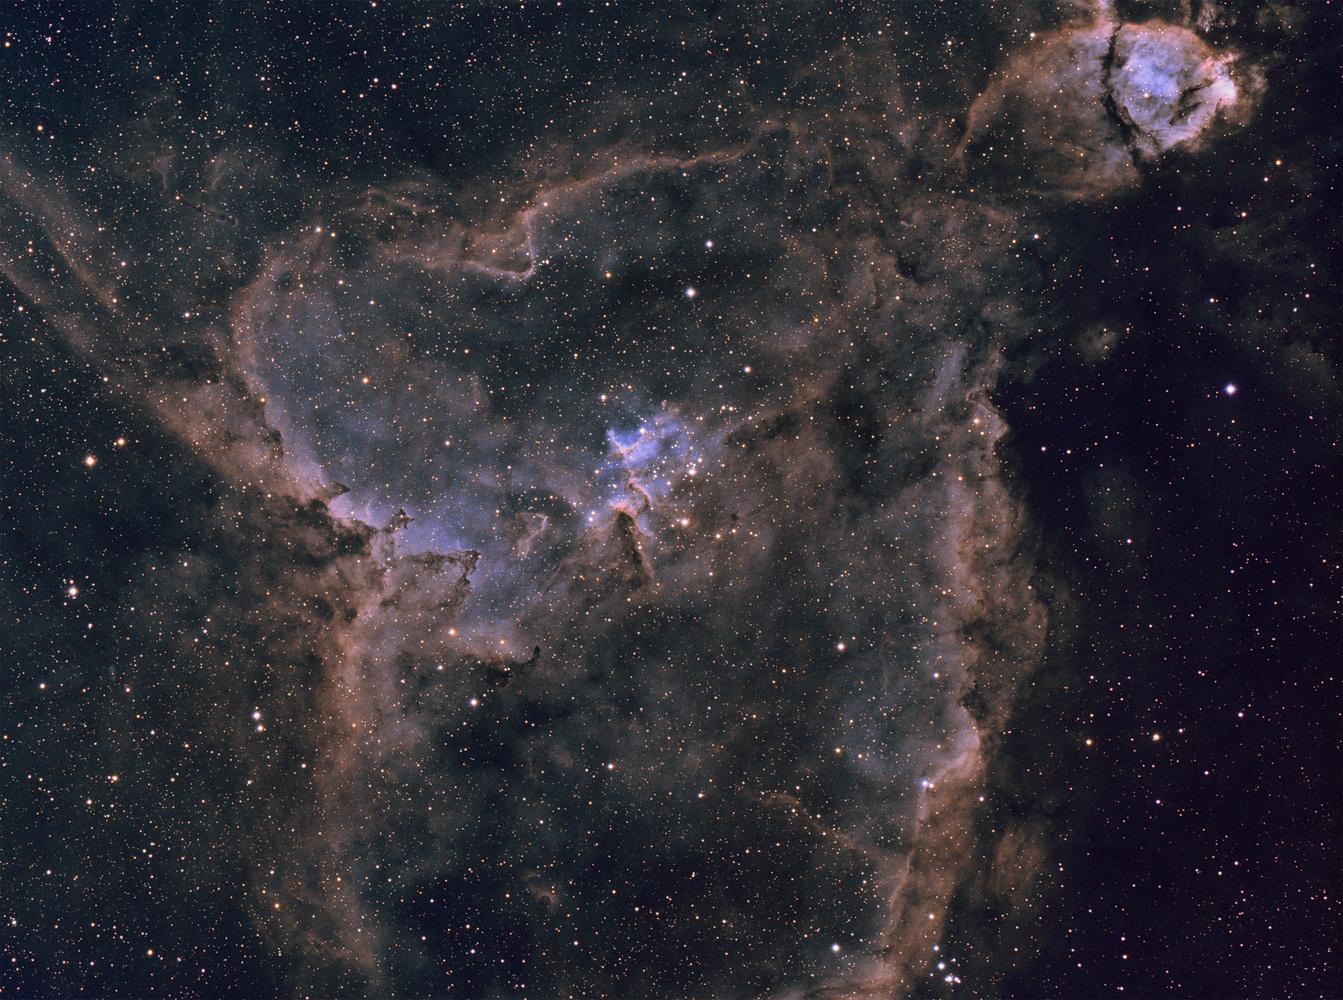 Heart Nebula in Narrowband by Josh Borup